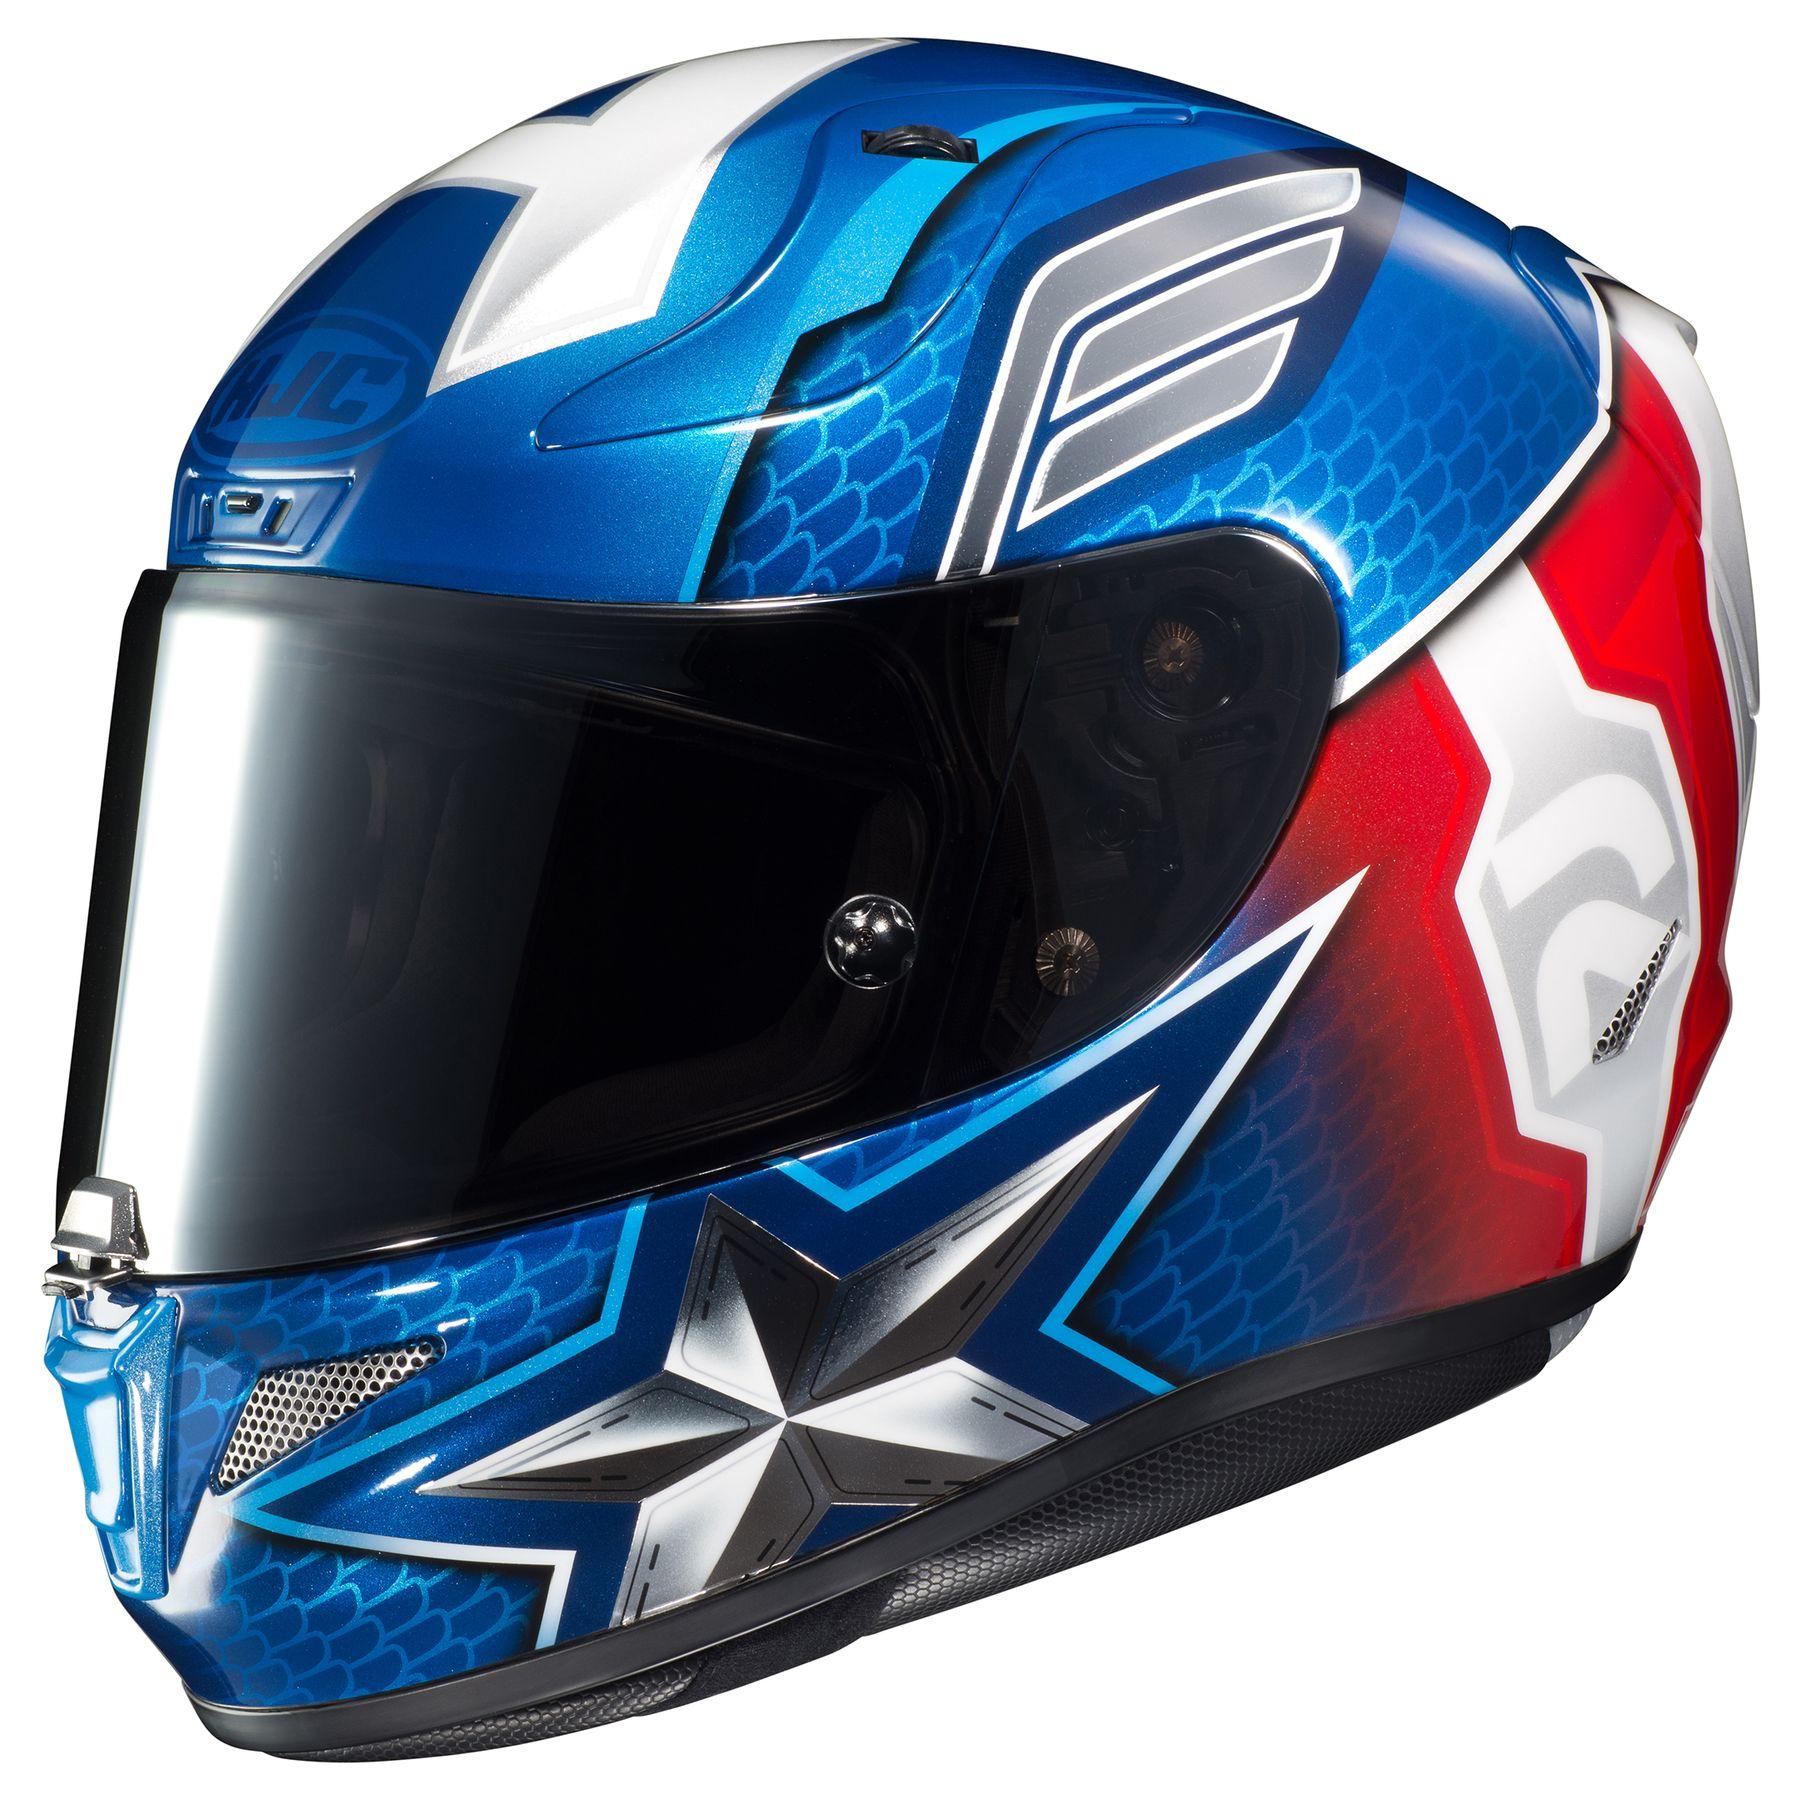 Bike HJC Helmet Shield Visor HJ-26 Dark Smoke For R-PHA 11,Pinlock Ready